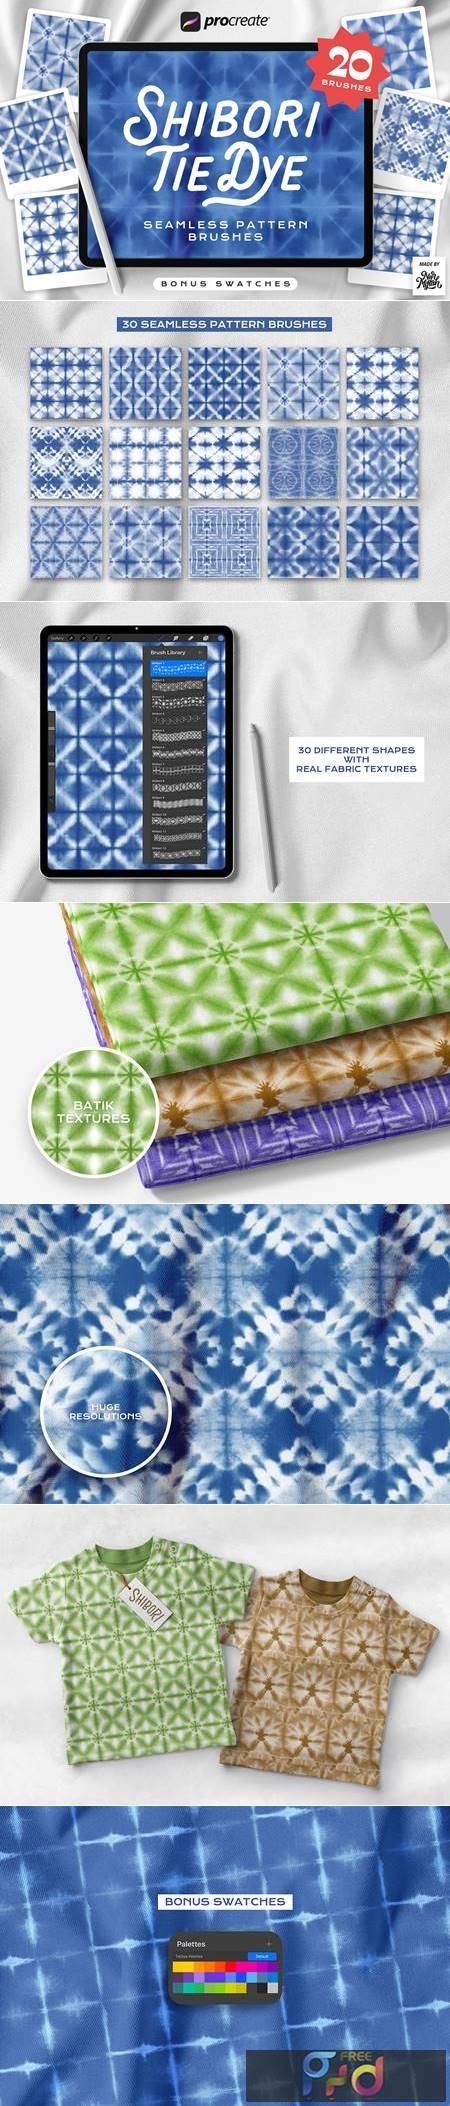 Procreate Tie Dye Shibori Seamless Pattern Brushes G3DW8XW 1